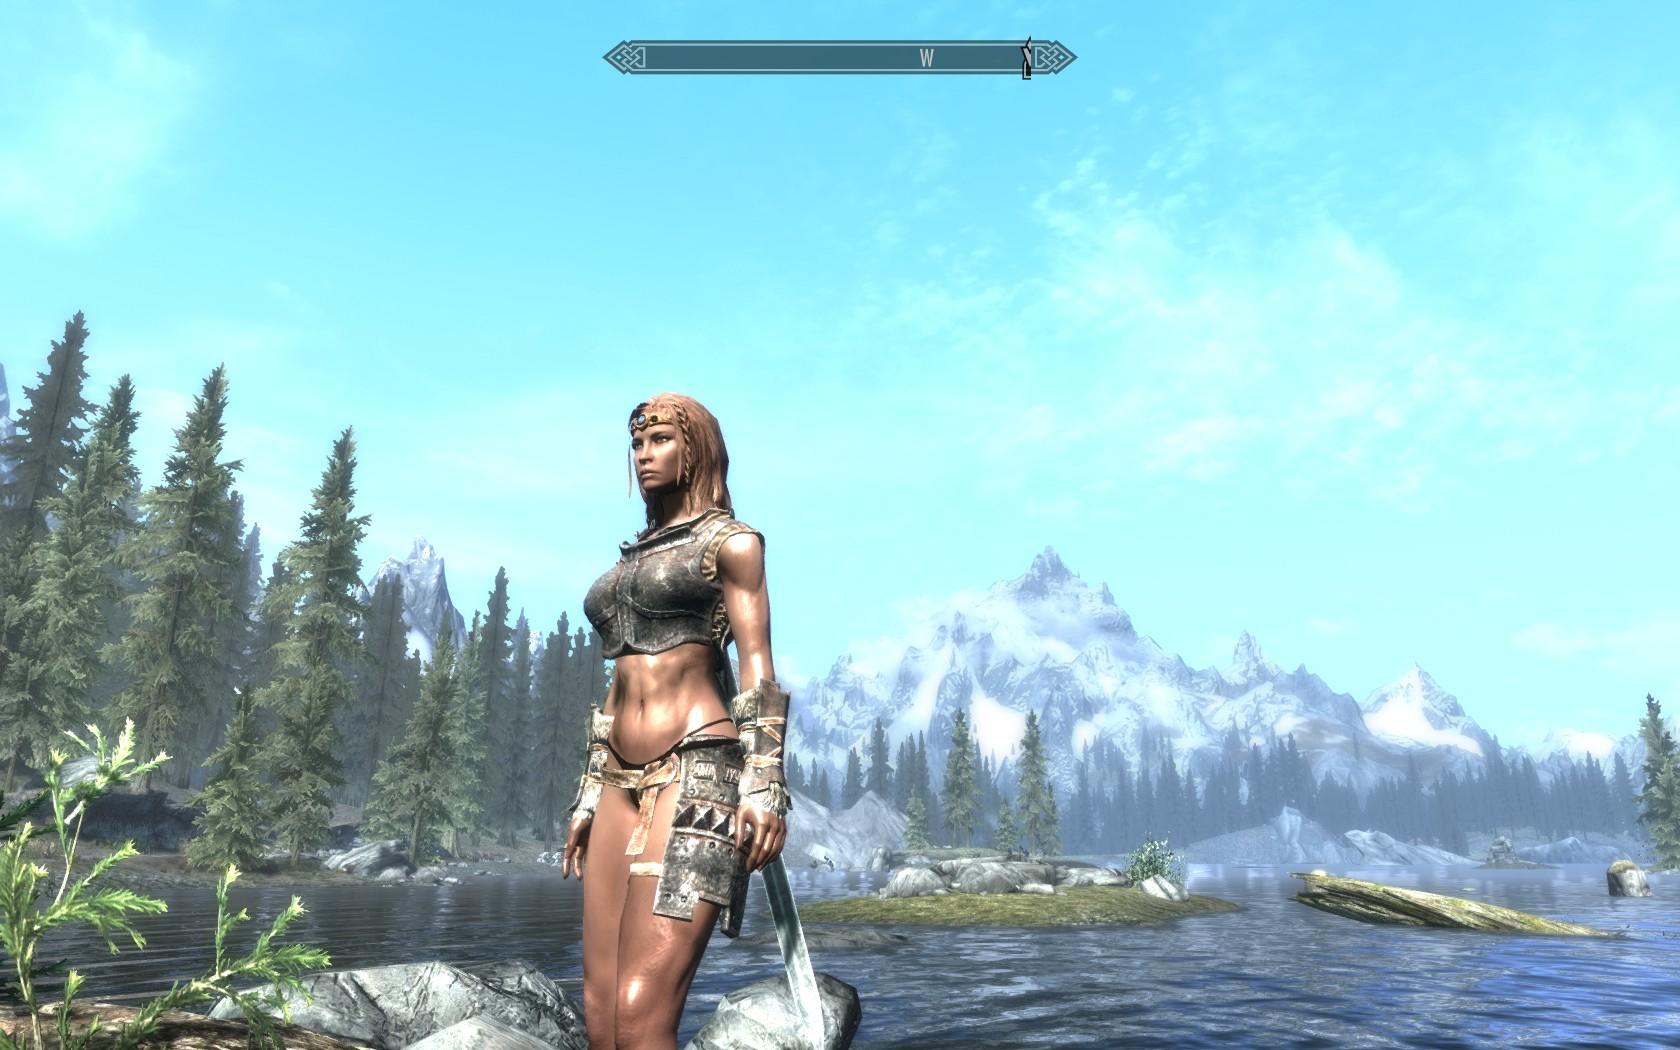 Elder scrolls online nudity erotic pic